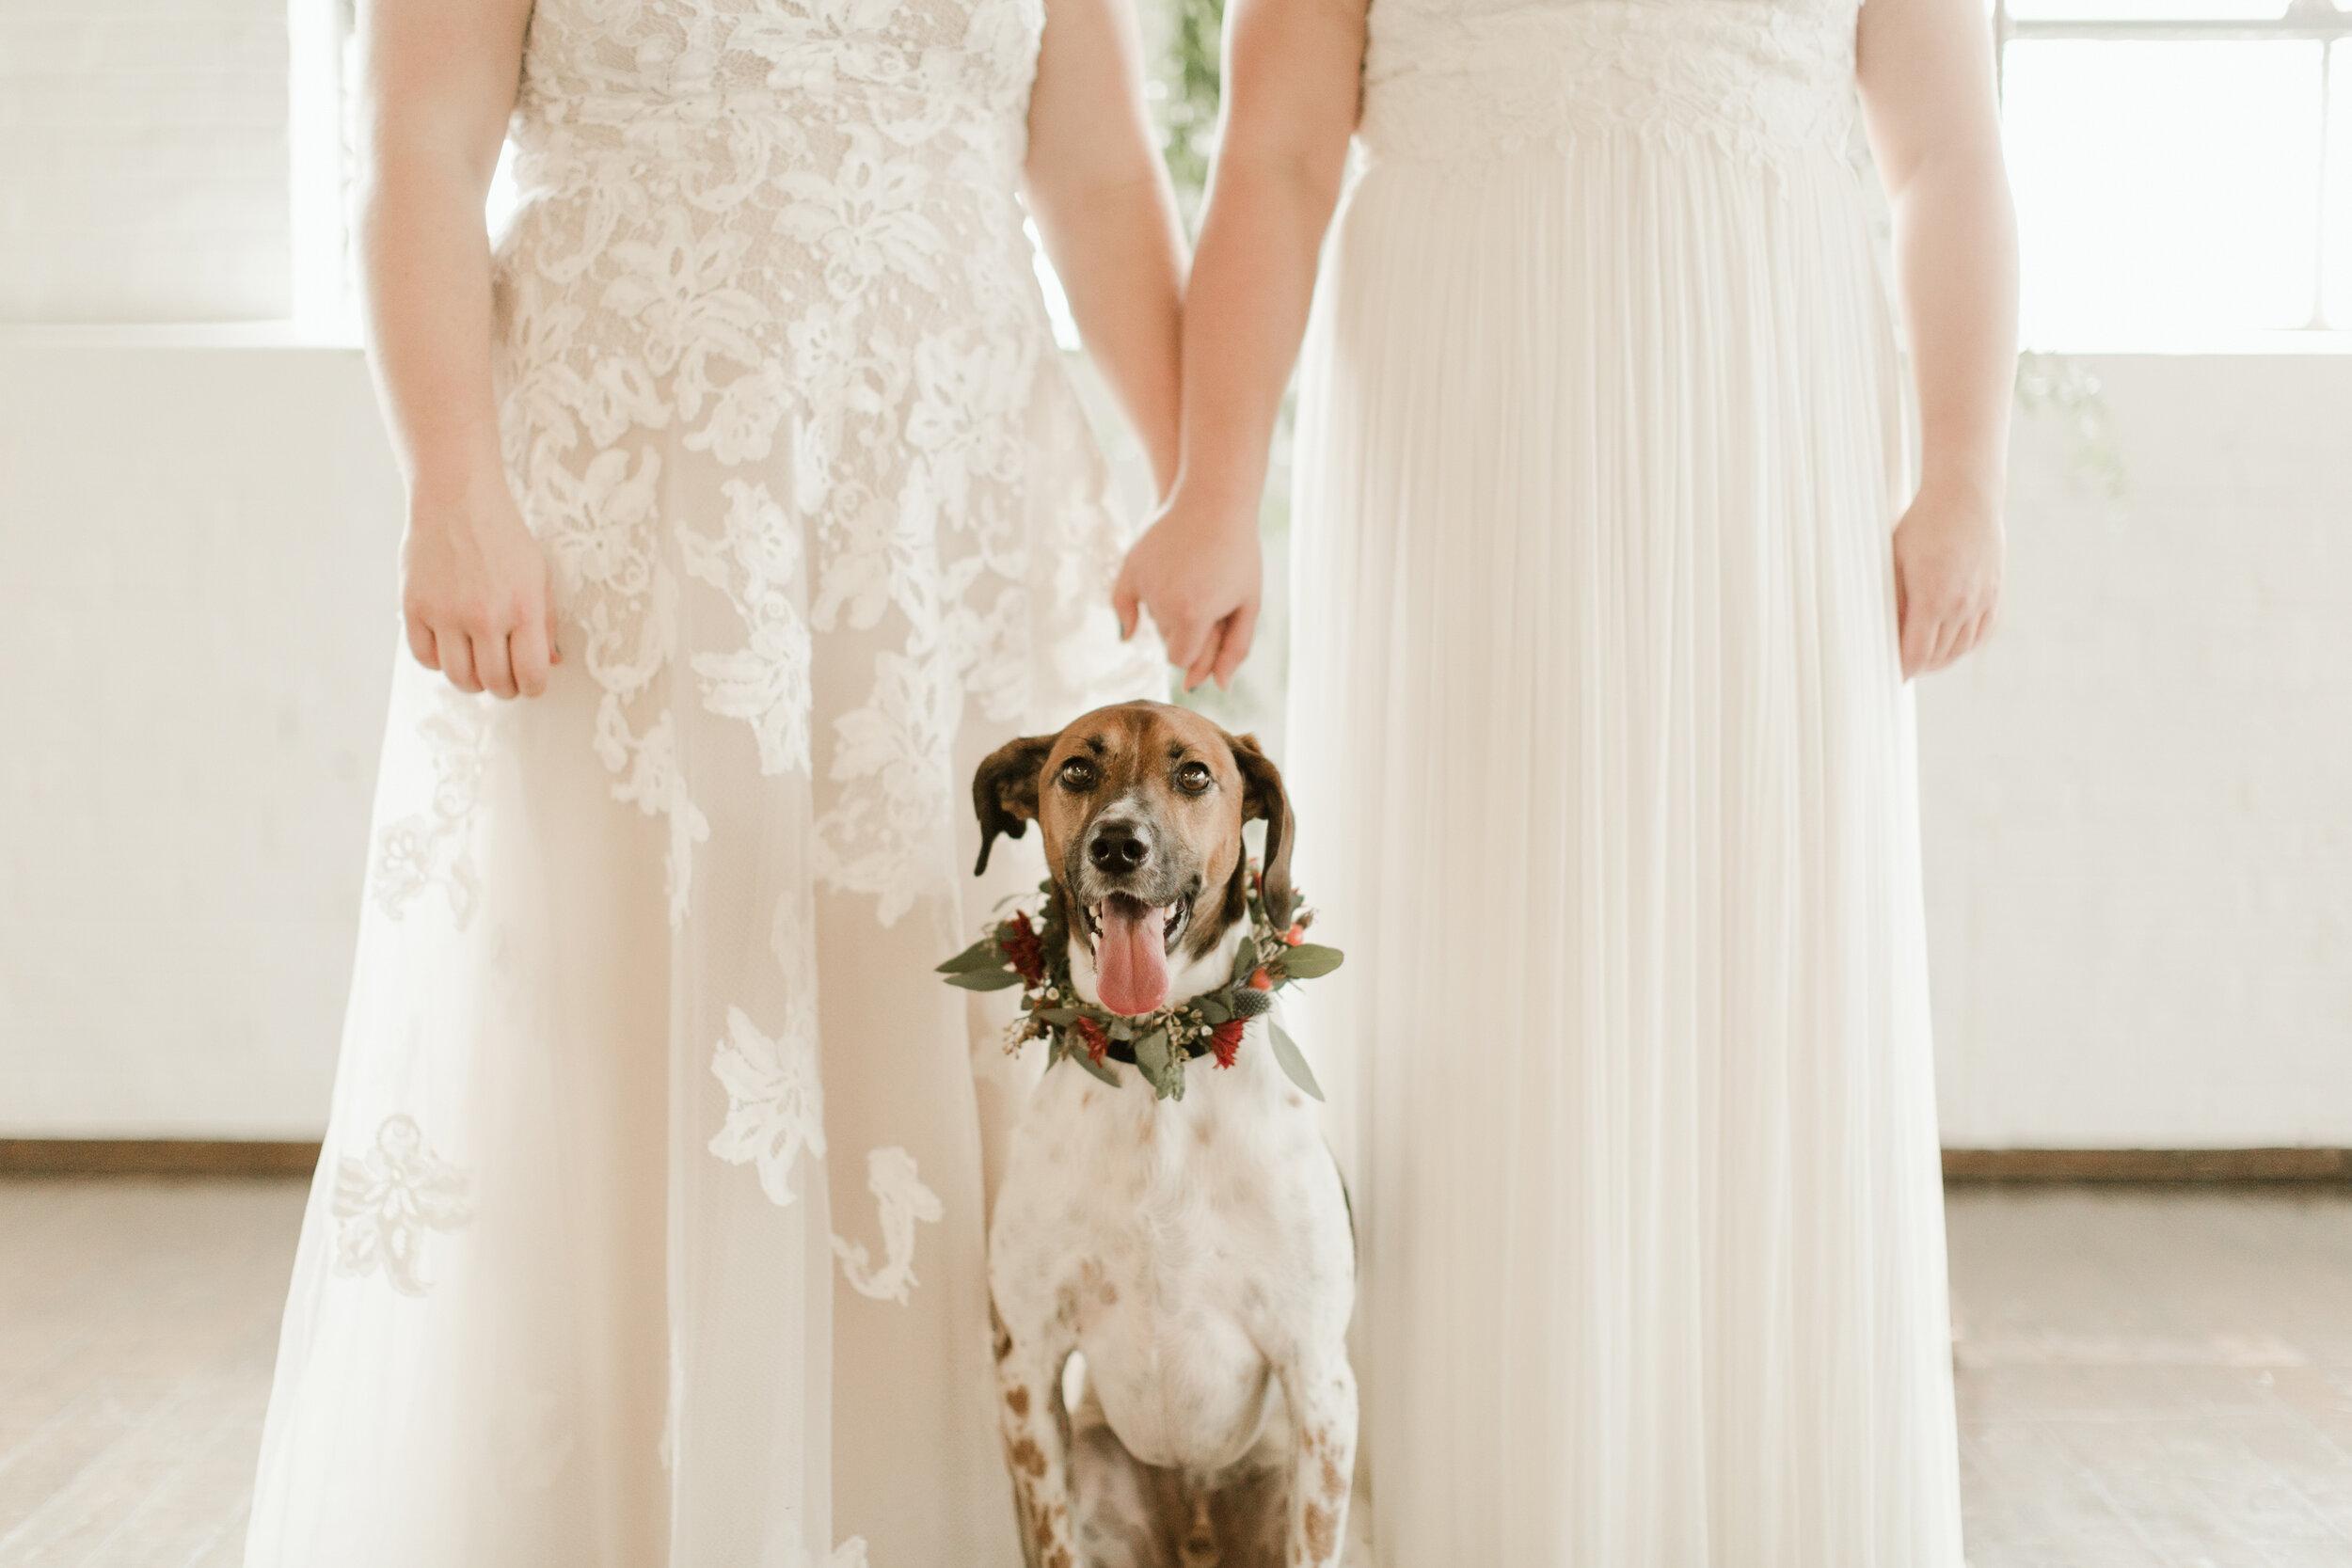 Tip #4: Bring your pet -